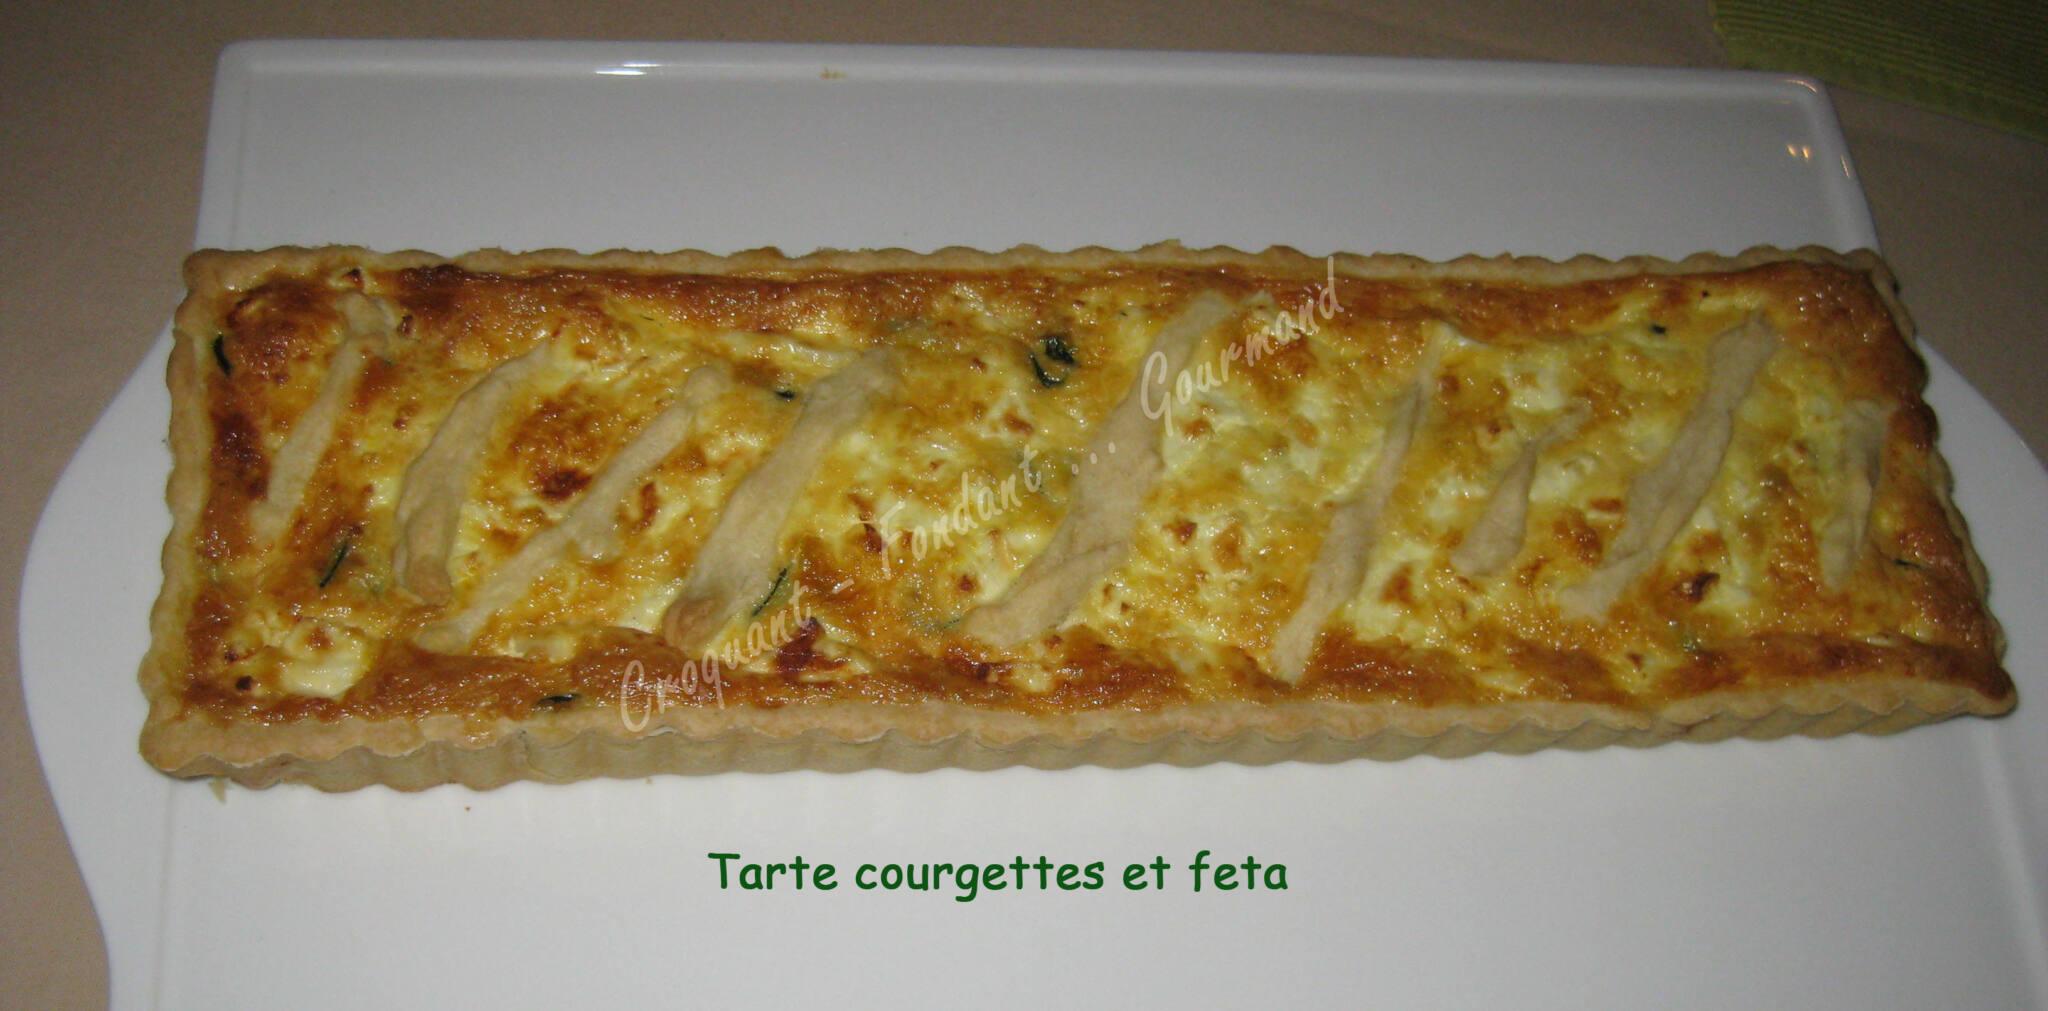 Tarte courgettes et feta IMG_4883_29373